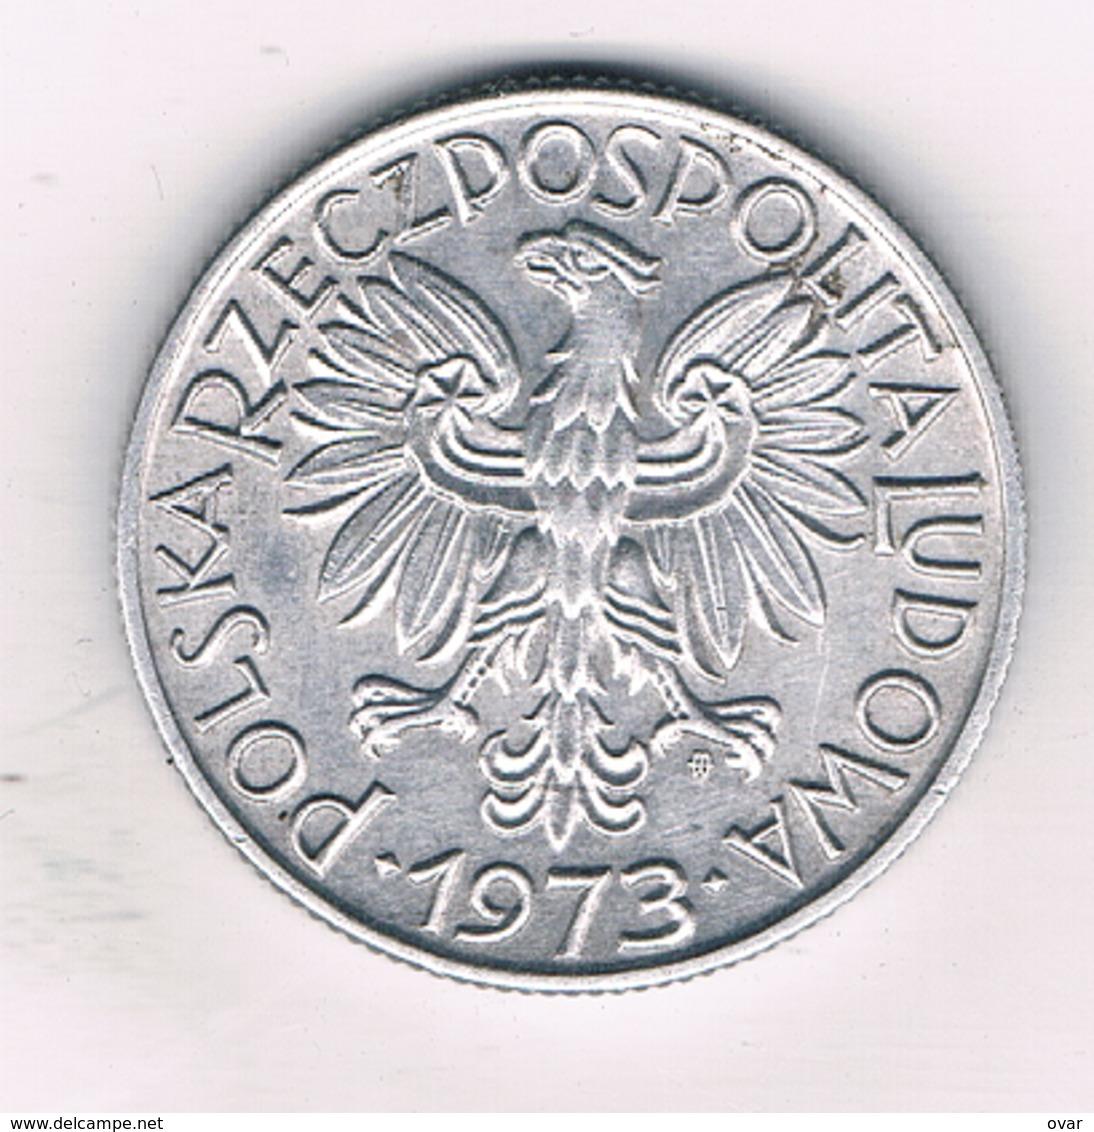 5 ZLOTYCH 1973 POLEN /3184/ - Poland